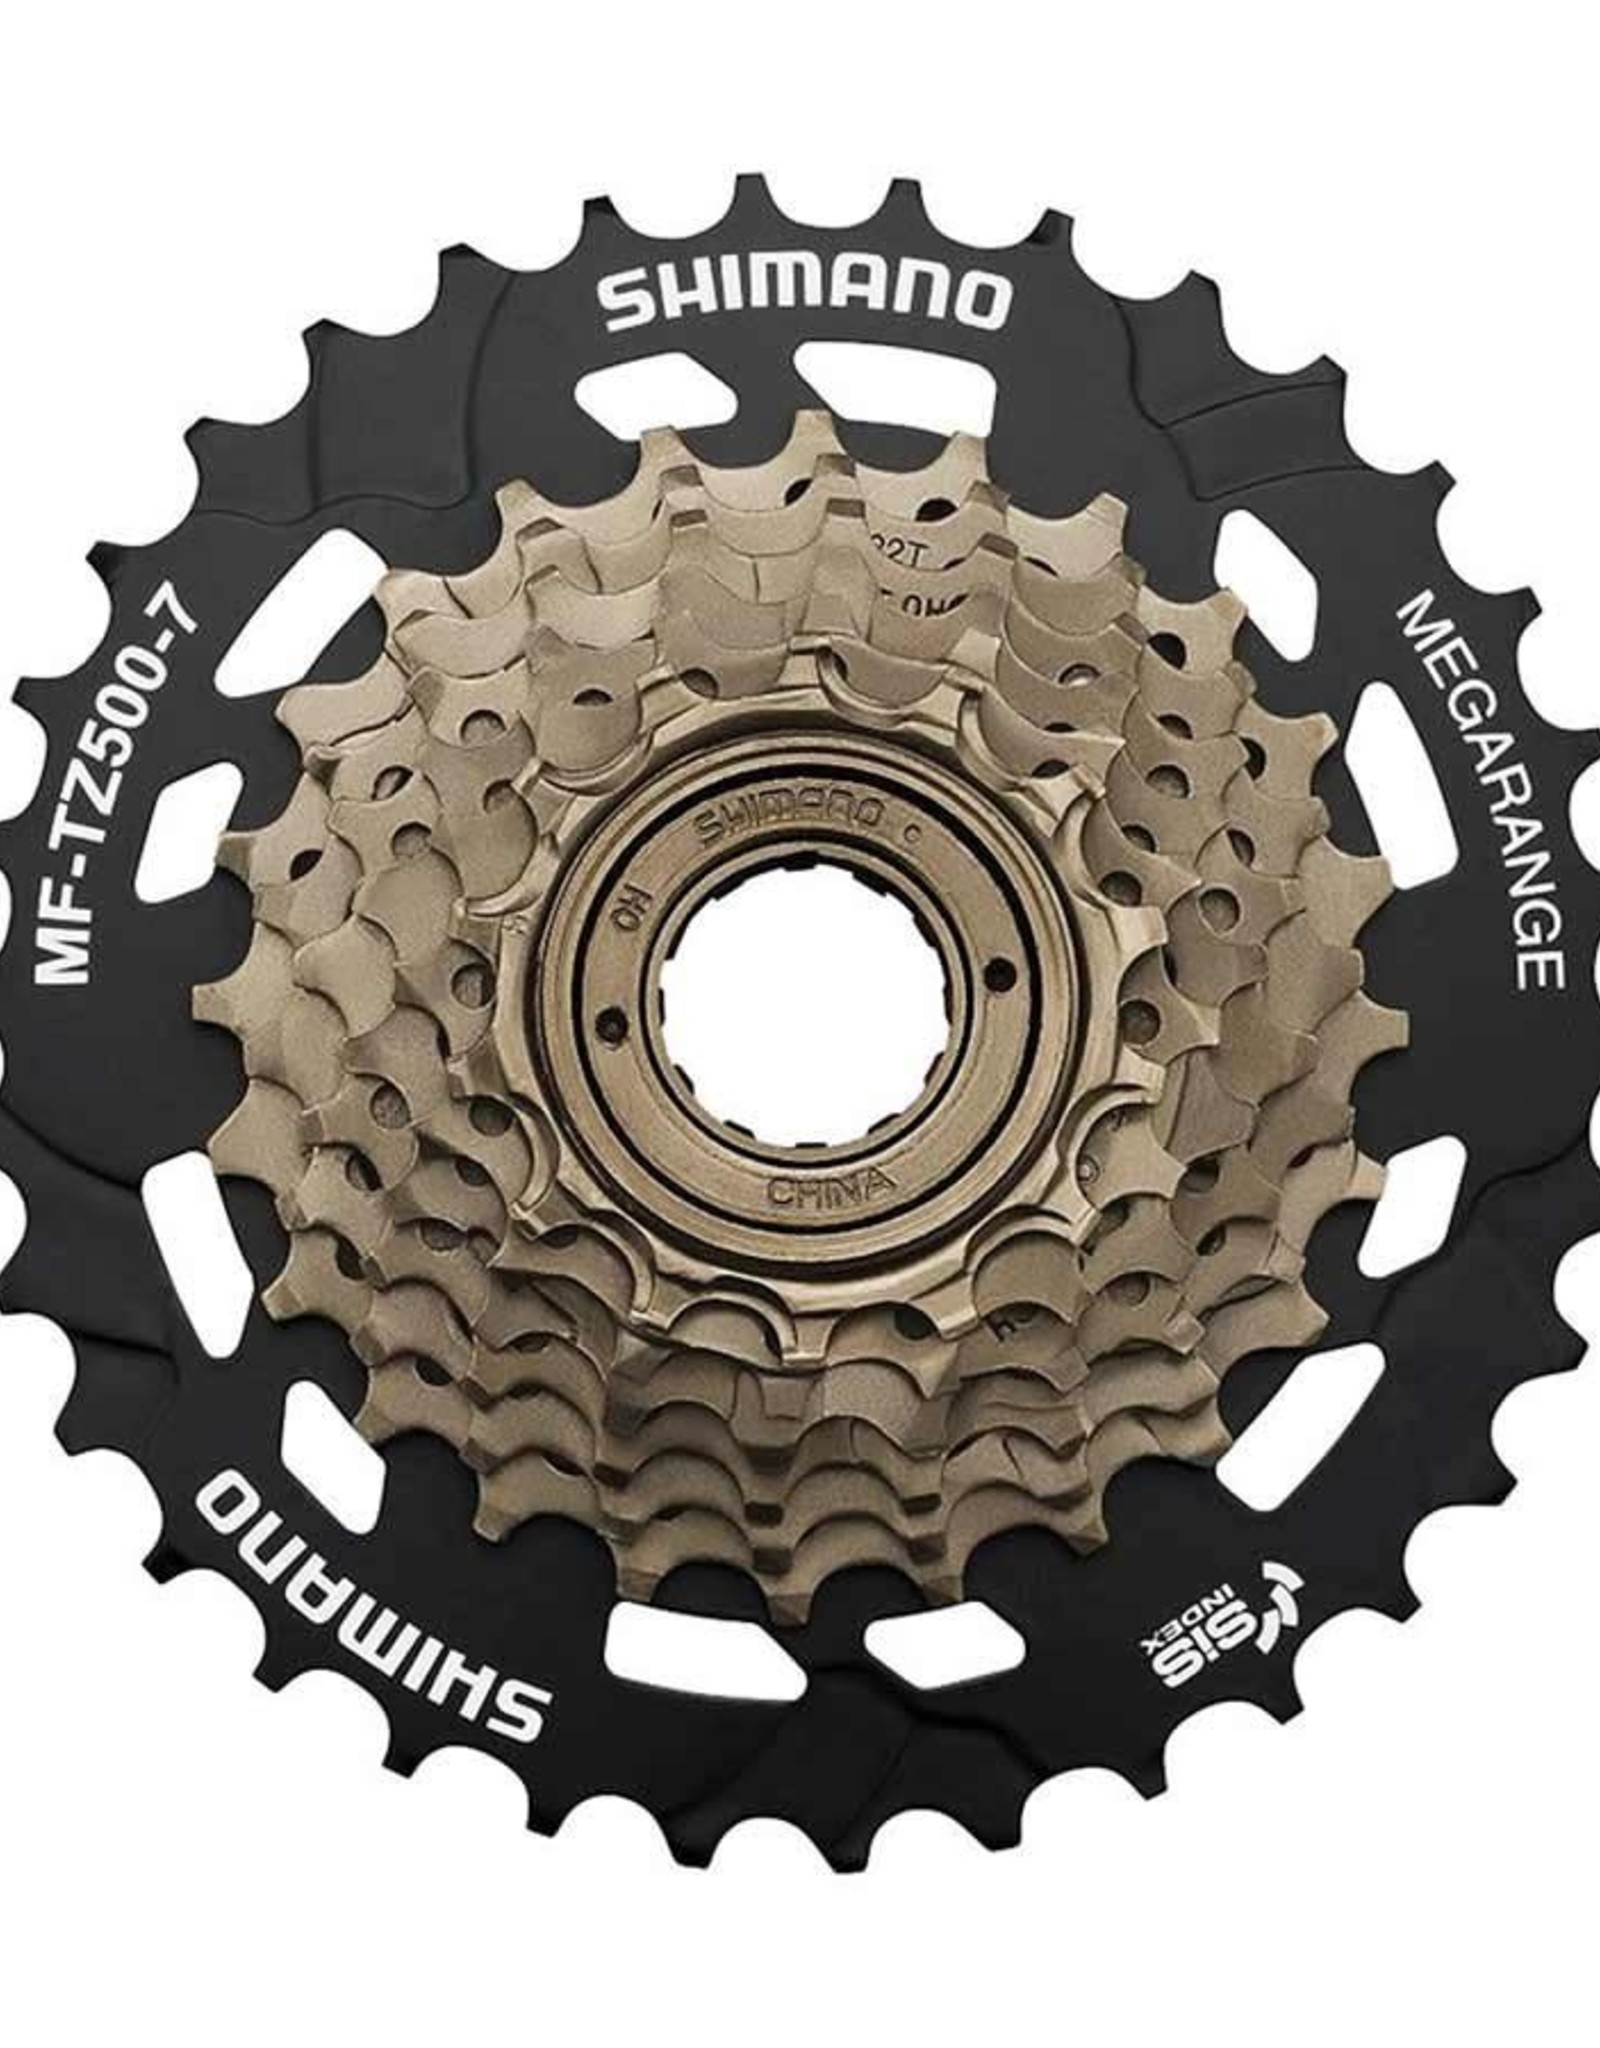 Shimano Shimano, MF-TZ500, 7sp. Freewheel 14-34T